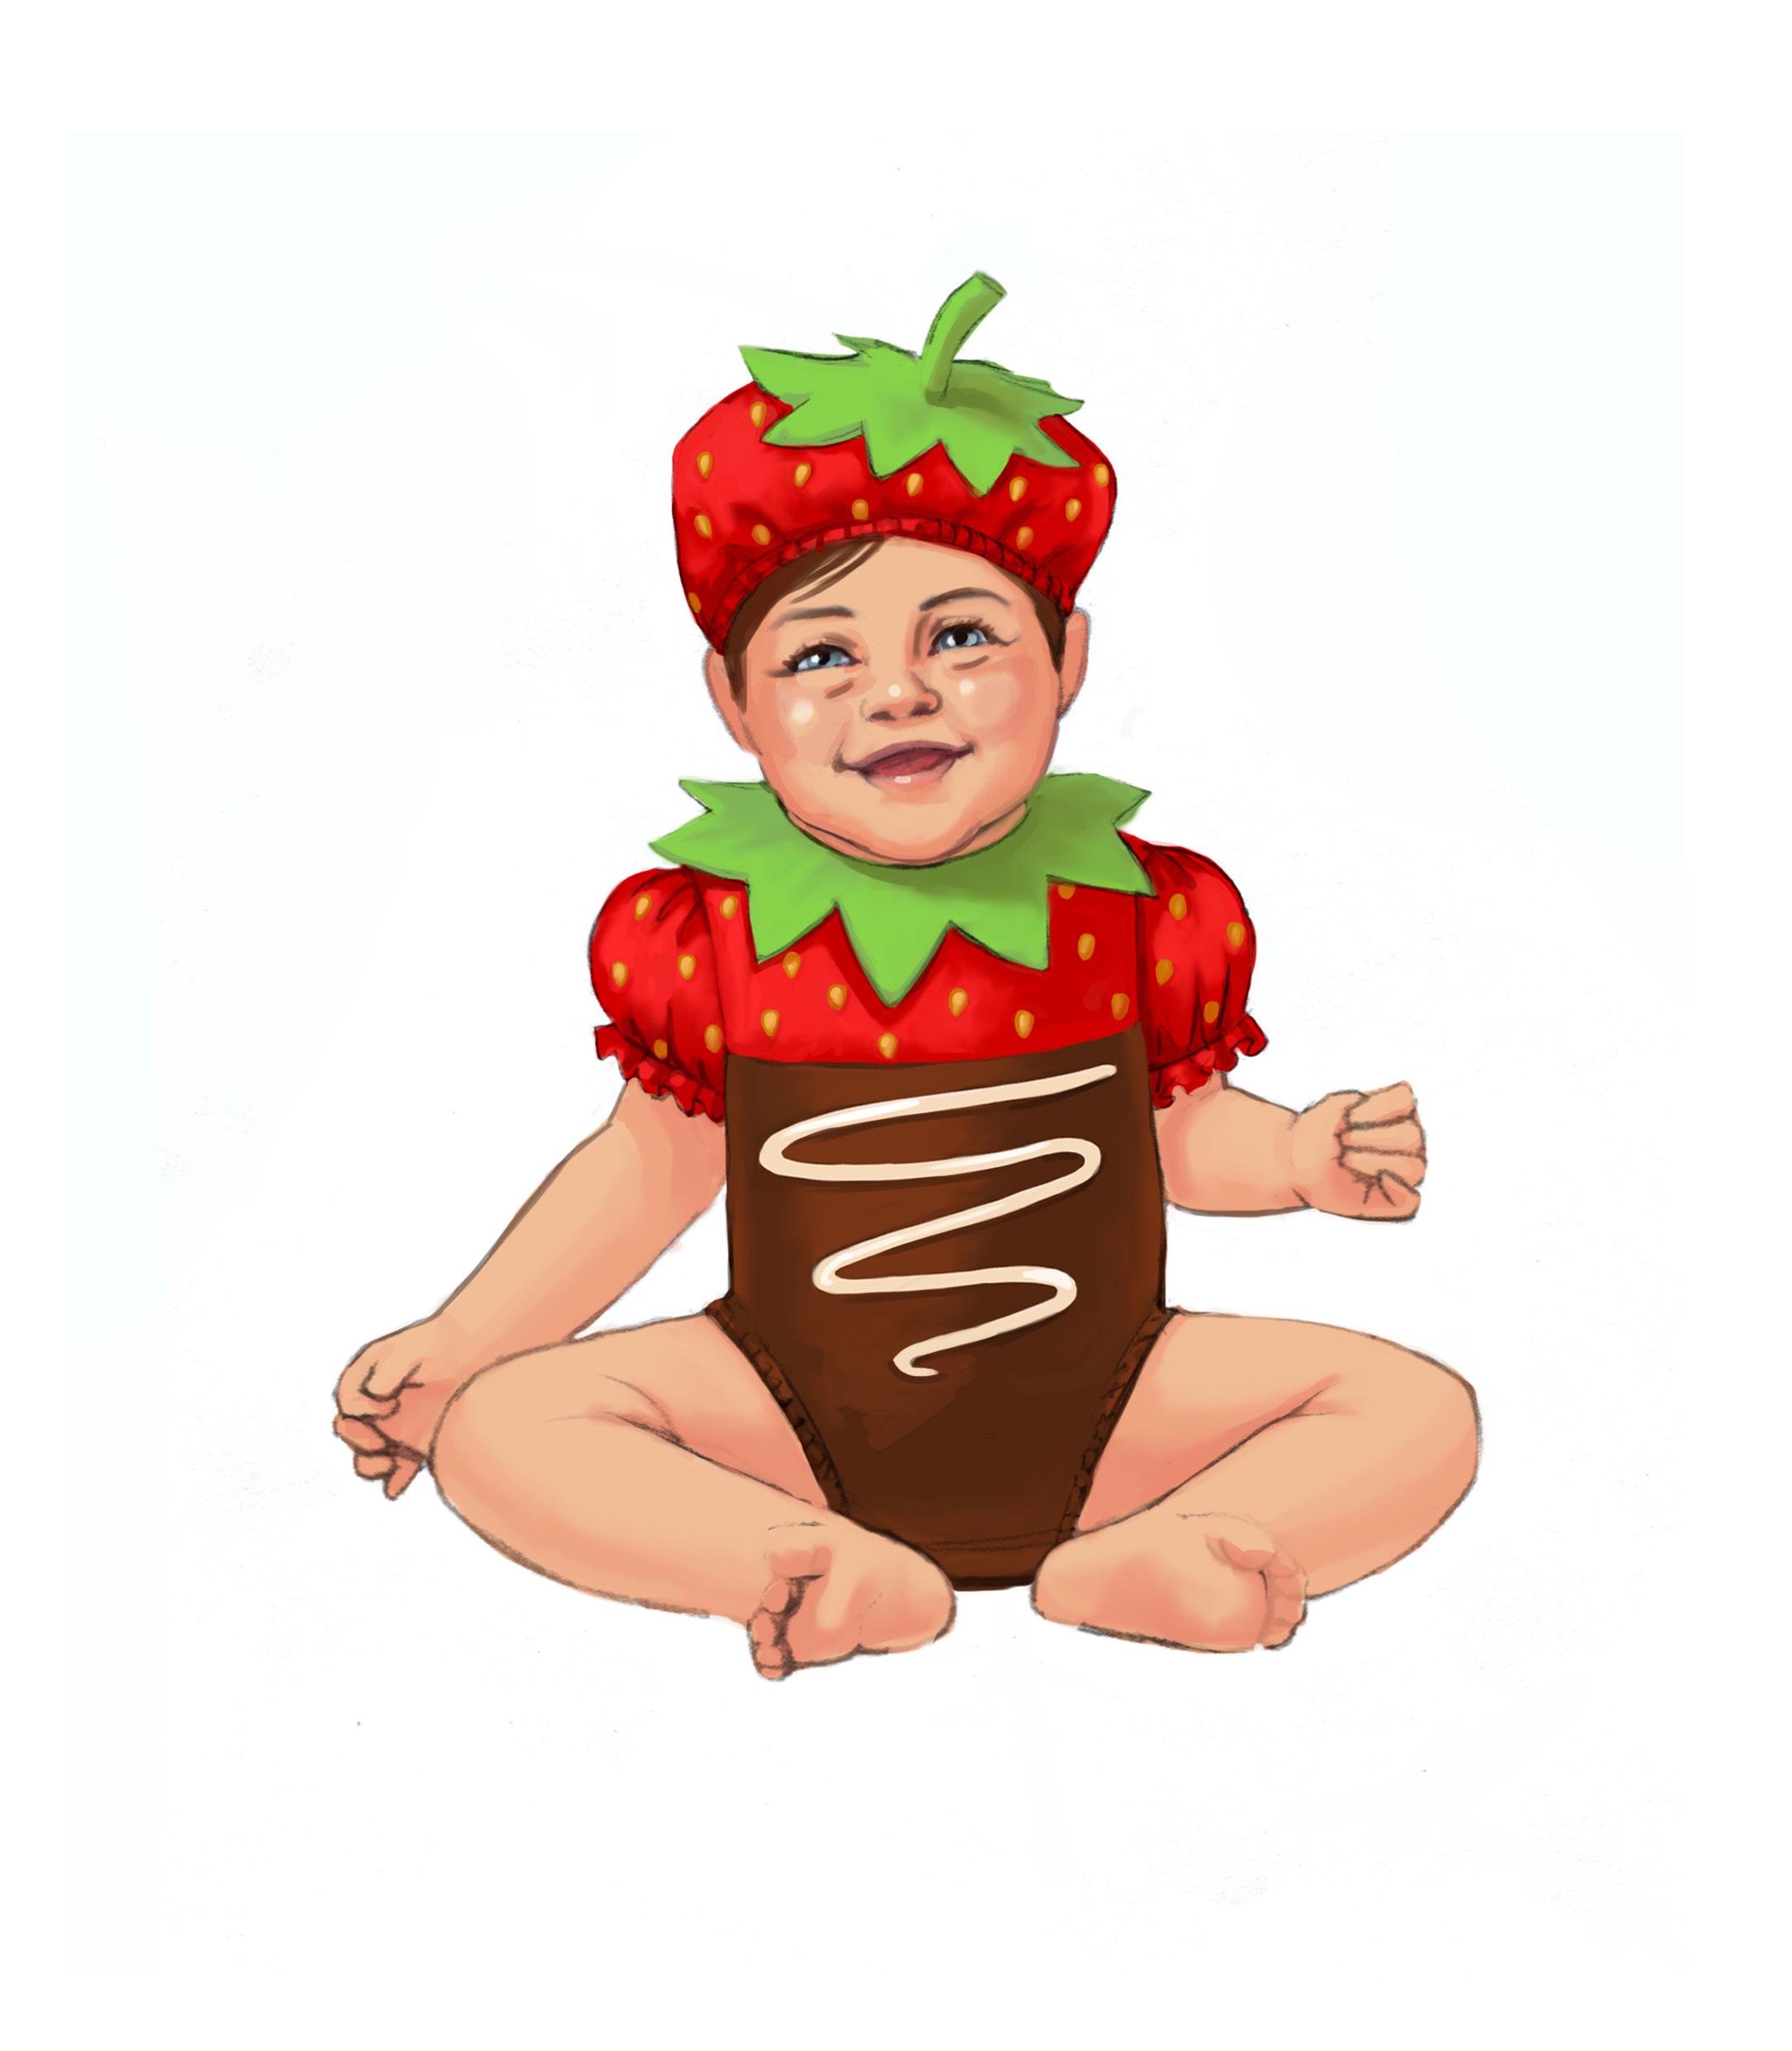 2BBabyChocoStrawberryValue.jpg